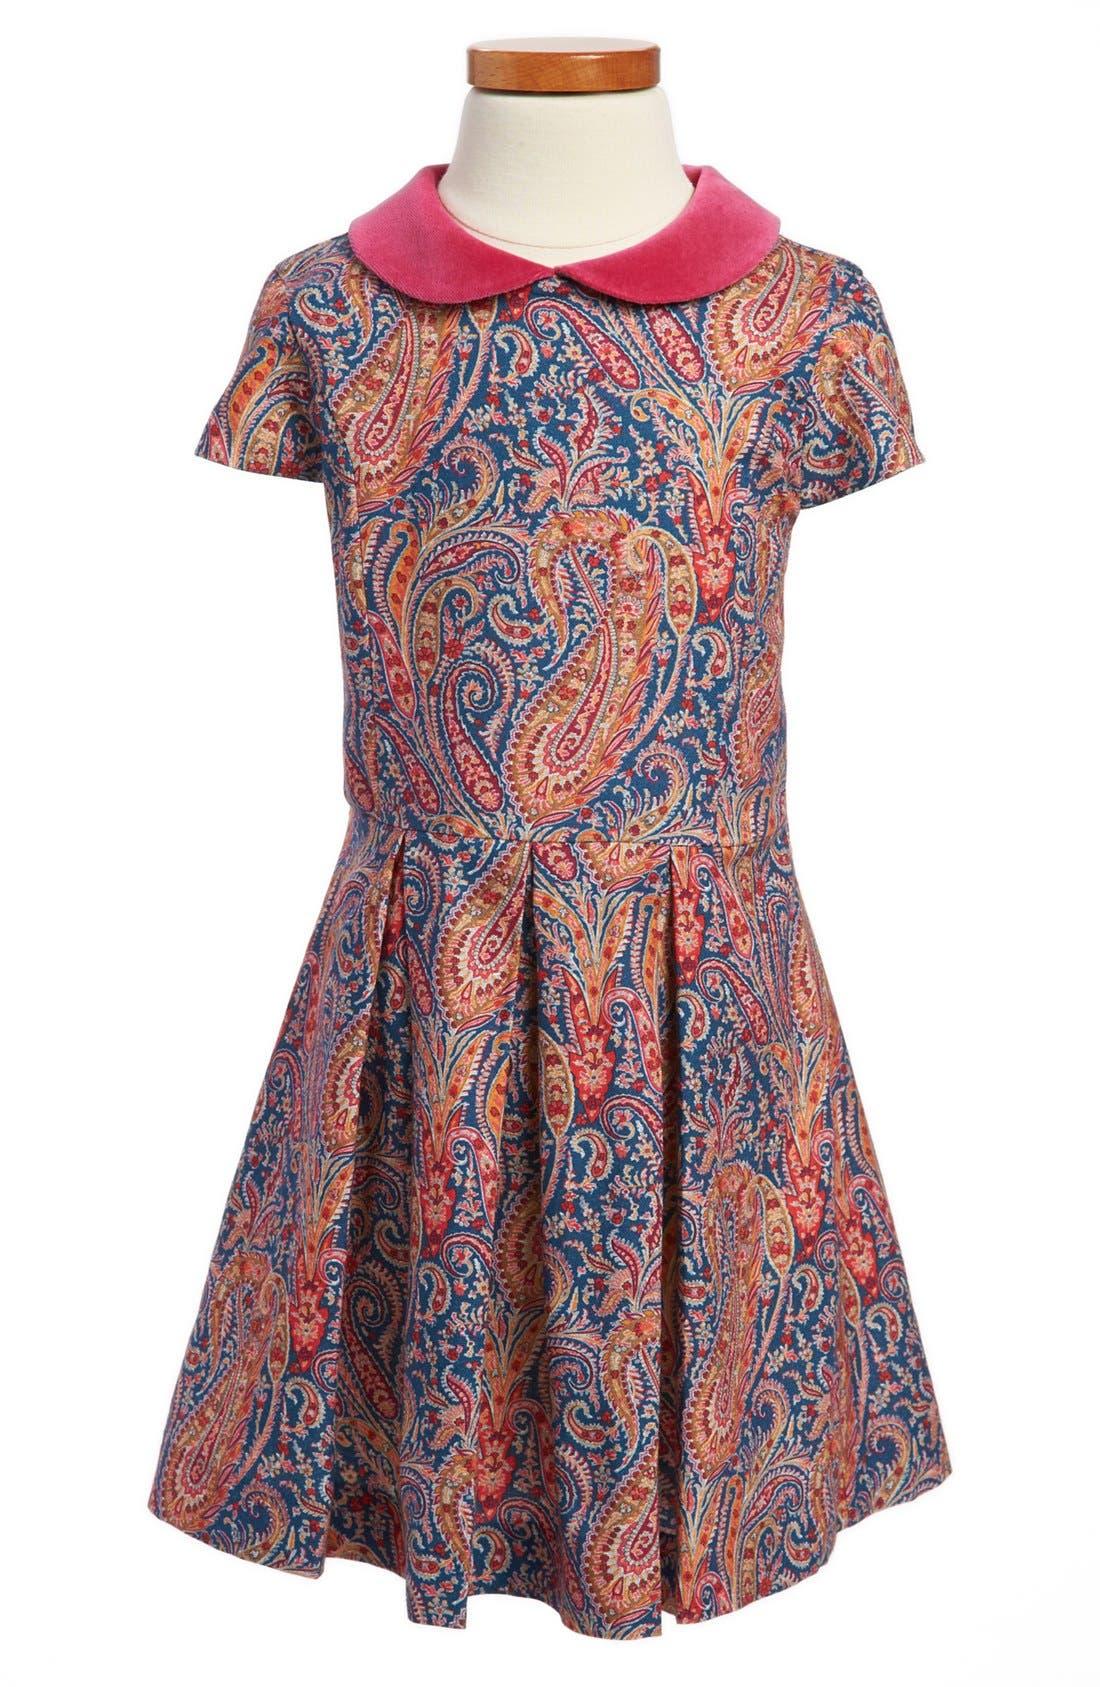 Main Image - Oscar de la Renta Cap Sleeve Party Dress (Toddler Girls, Little Girls & Big Girls)